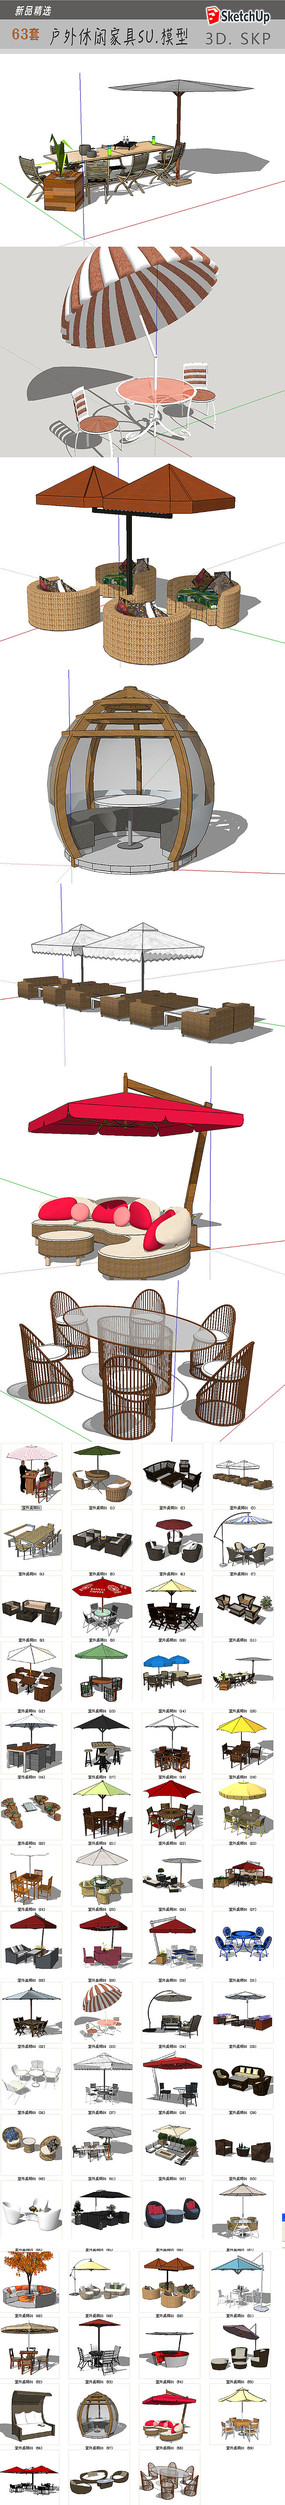 3D遮阳伞模型